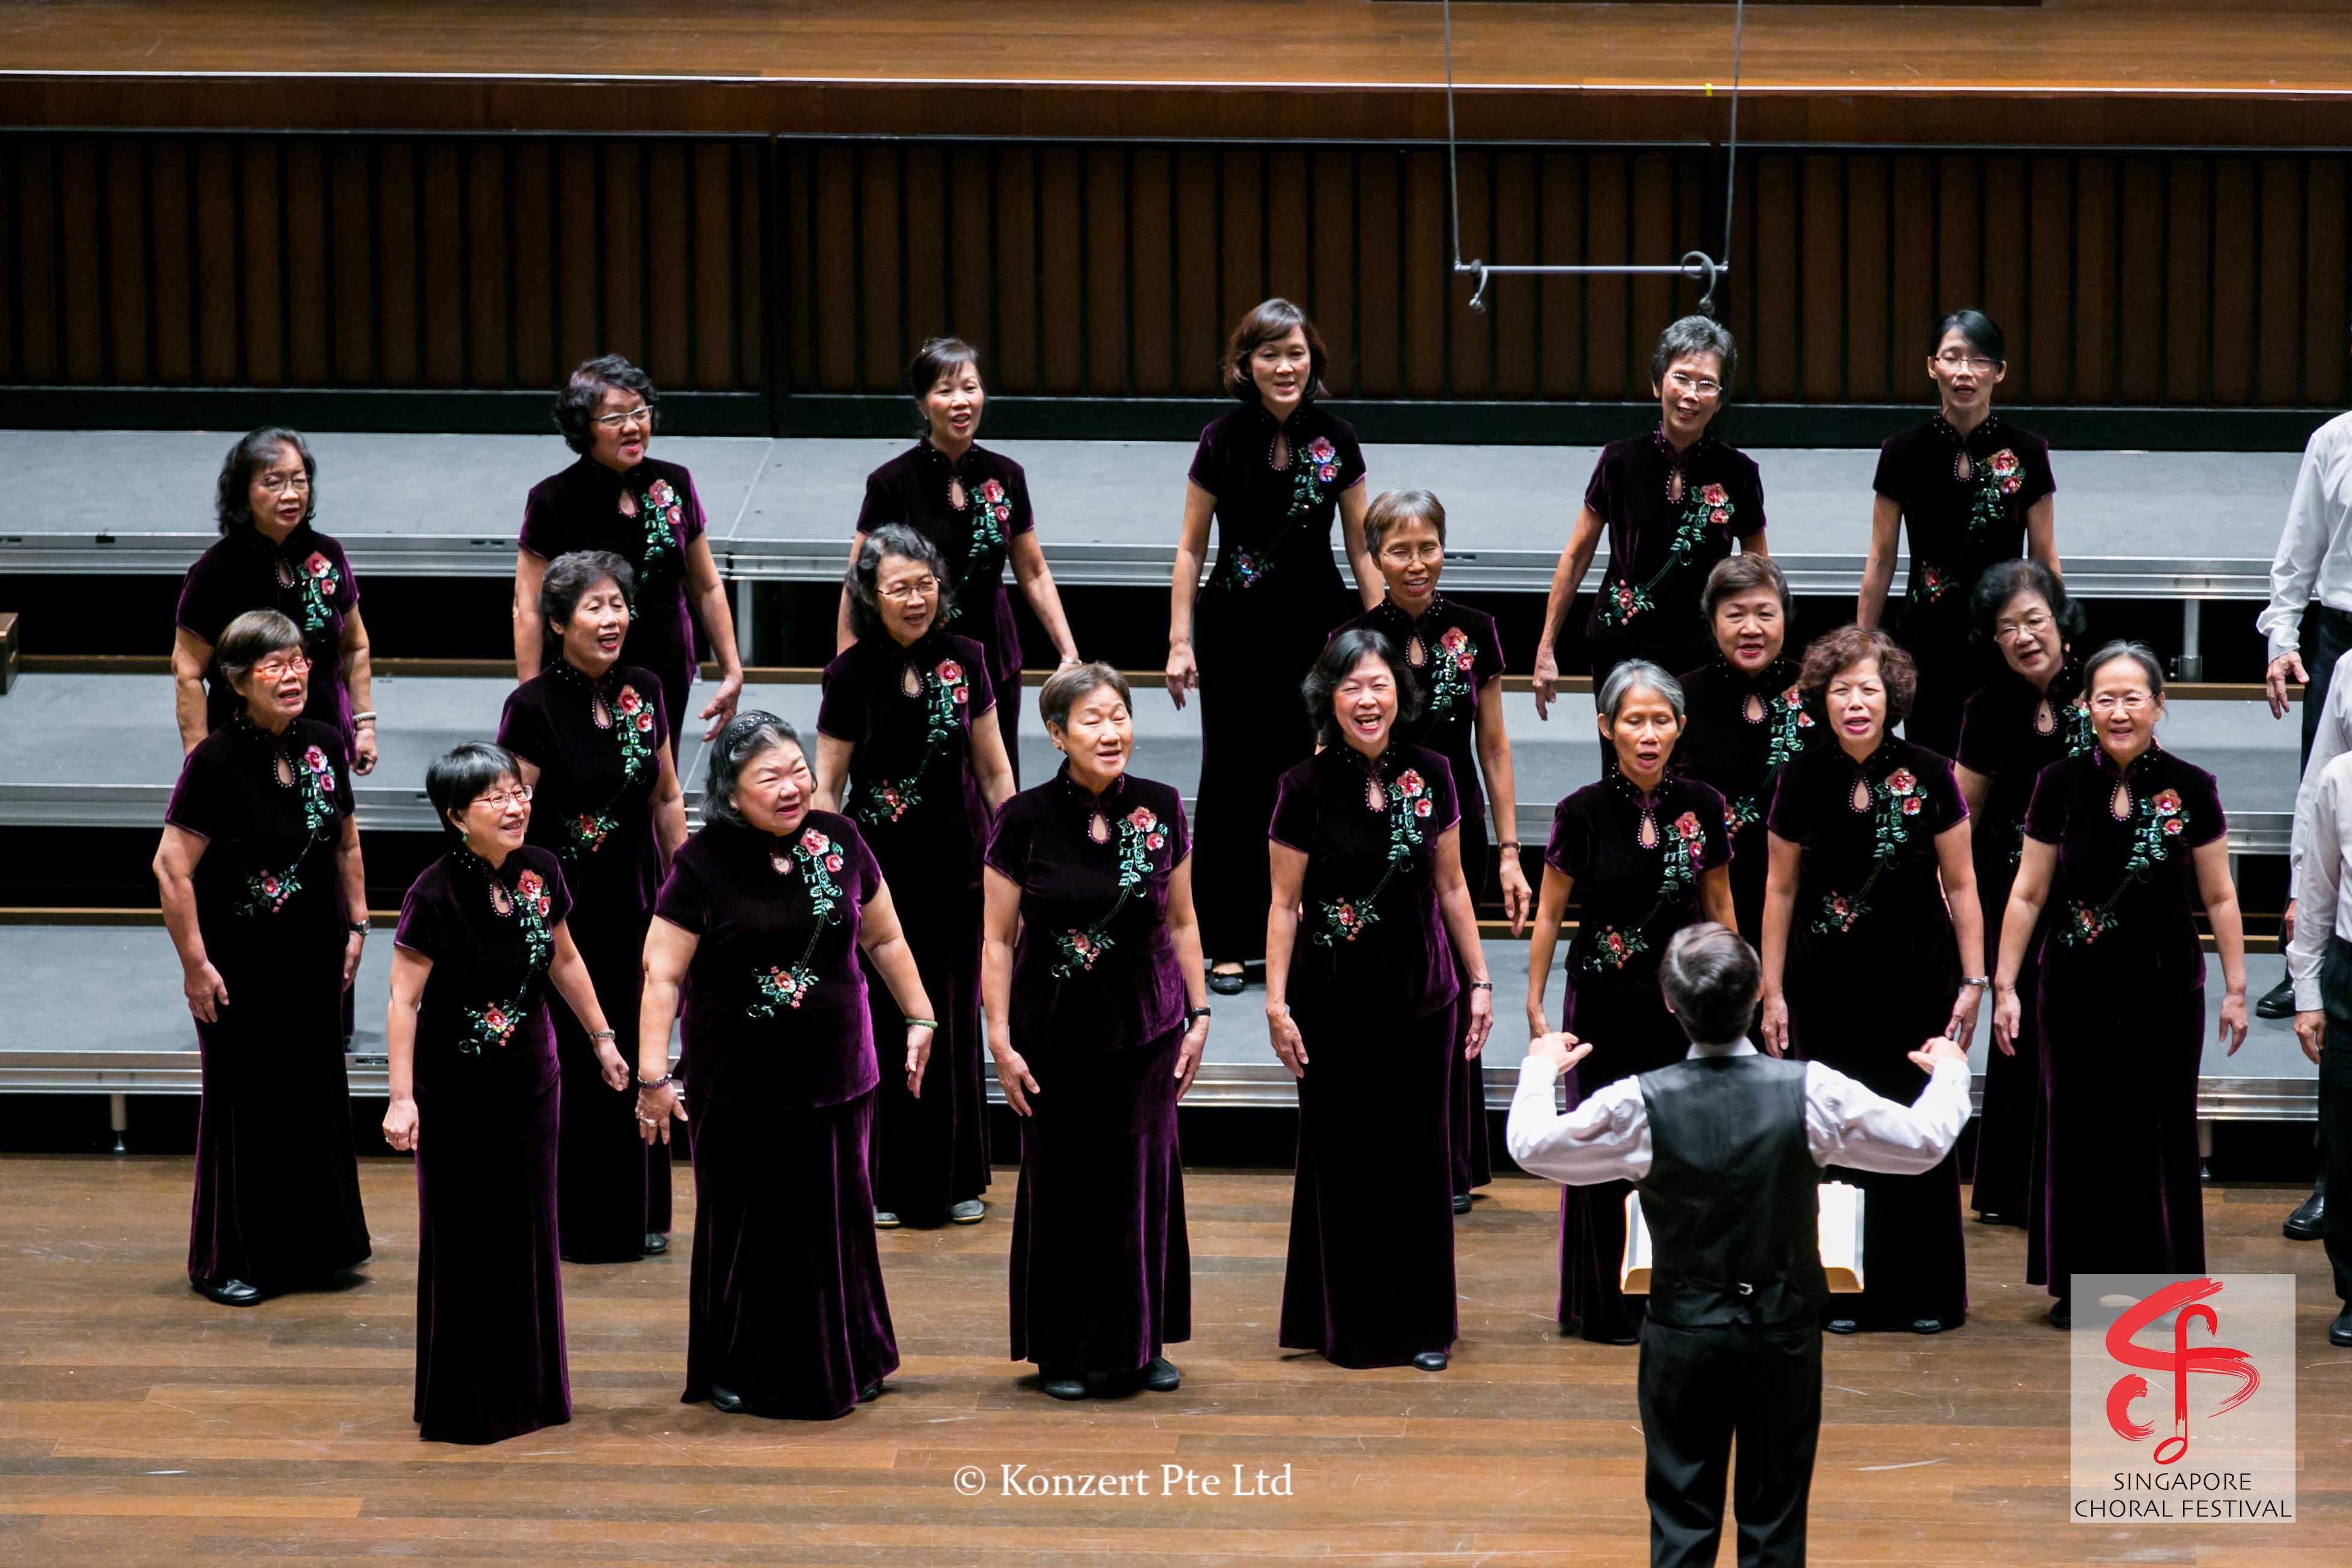 Singapore Choral Festival 8-8-15 (197).jpg